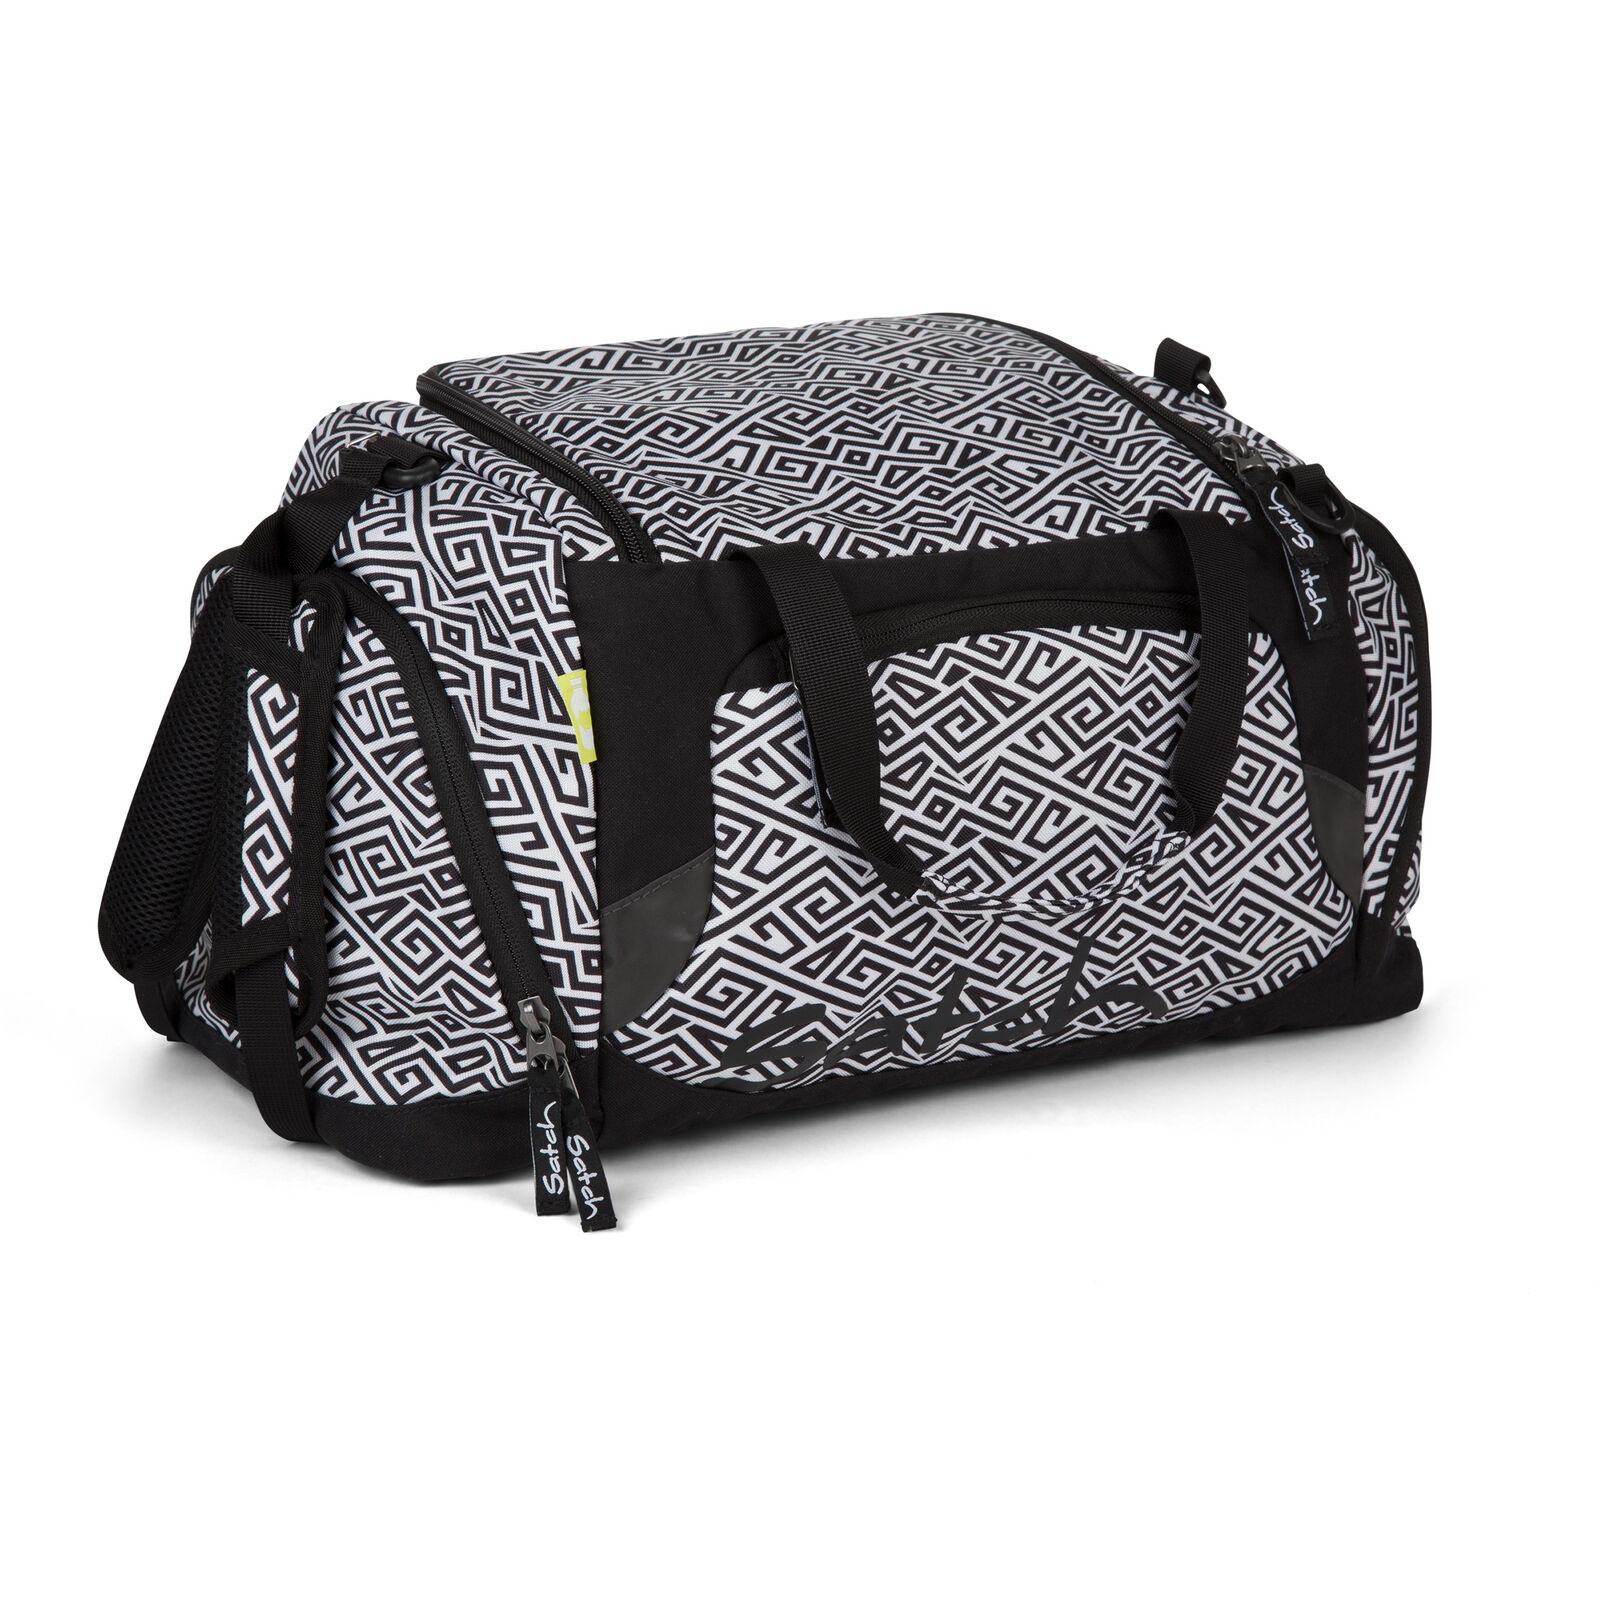 Satch sports bag 50 cm (snow safari tribal black white)